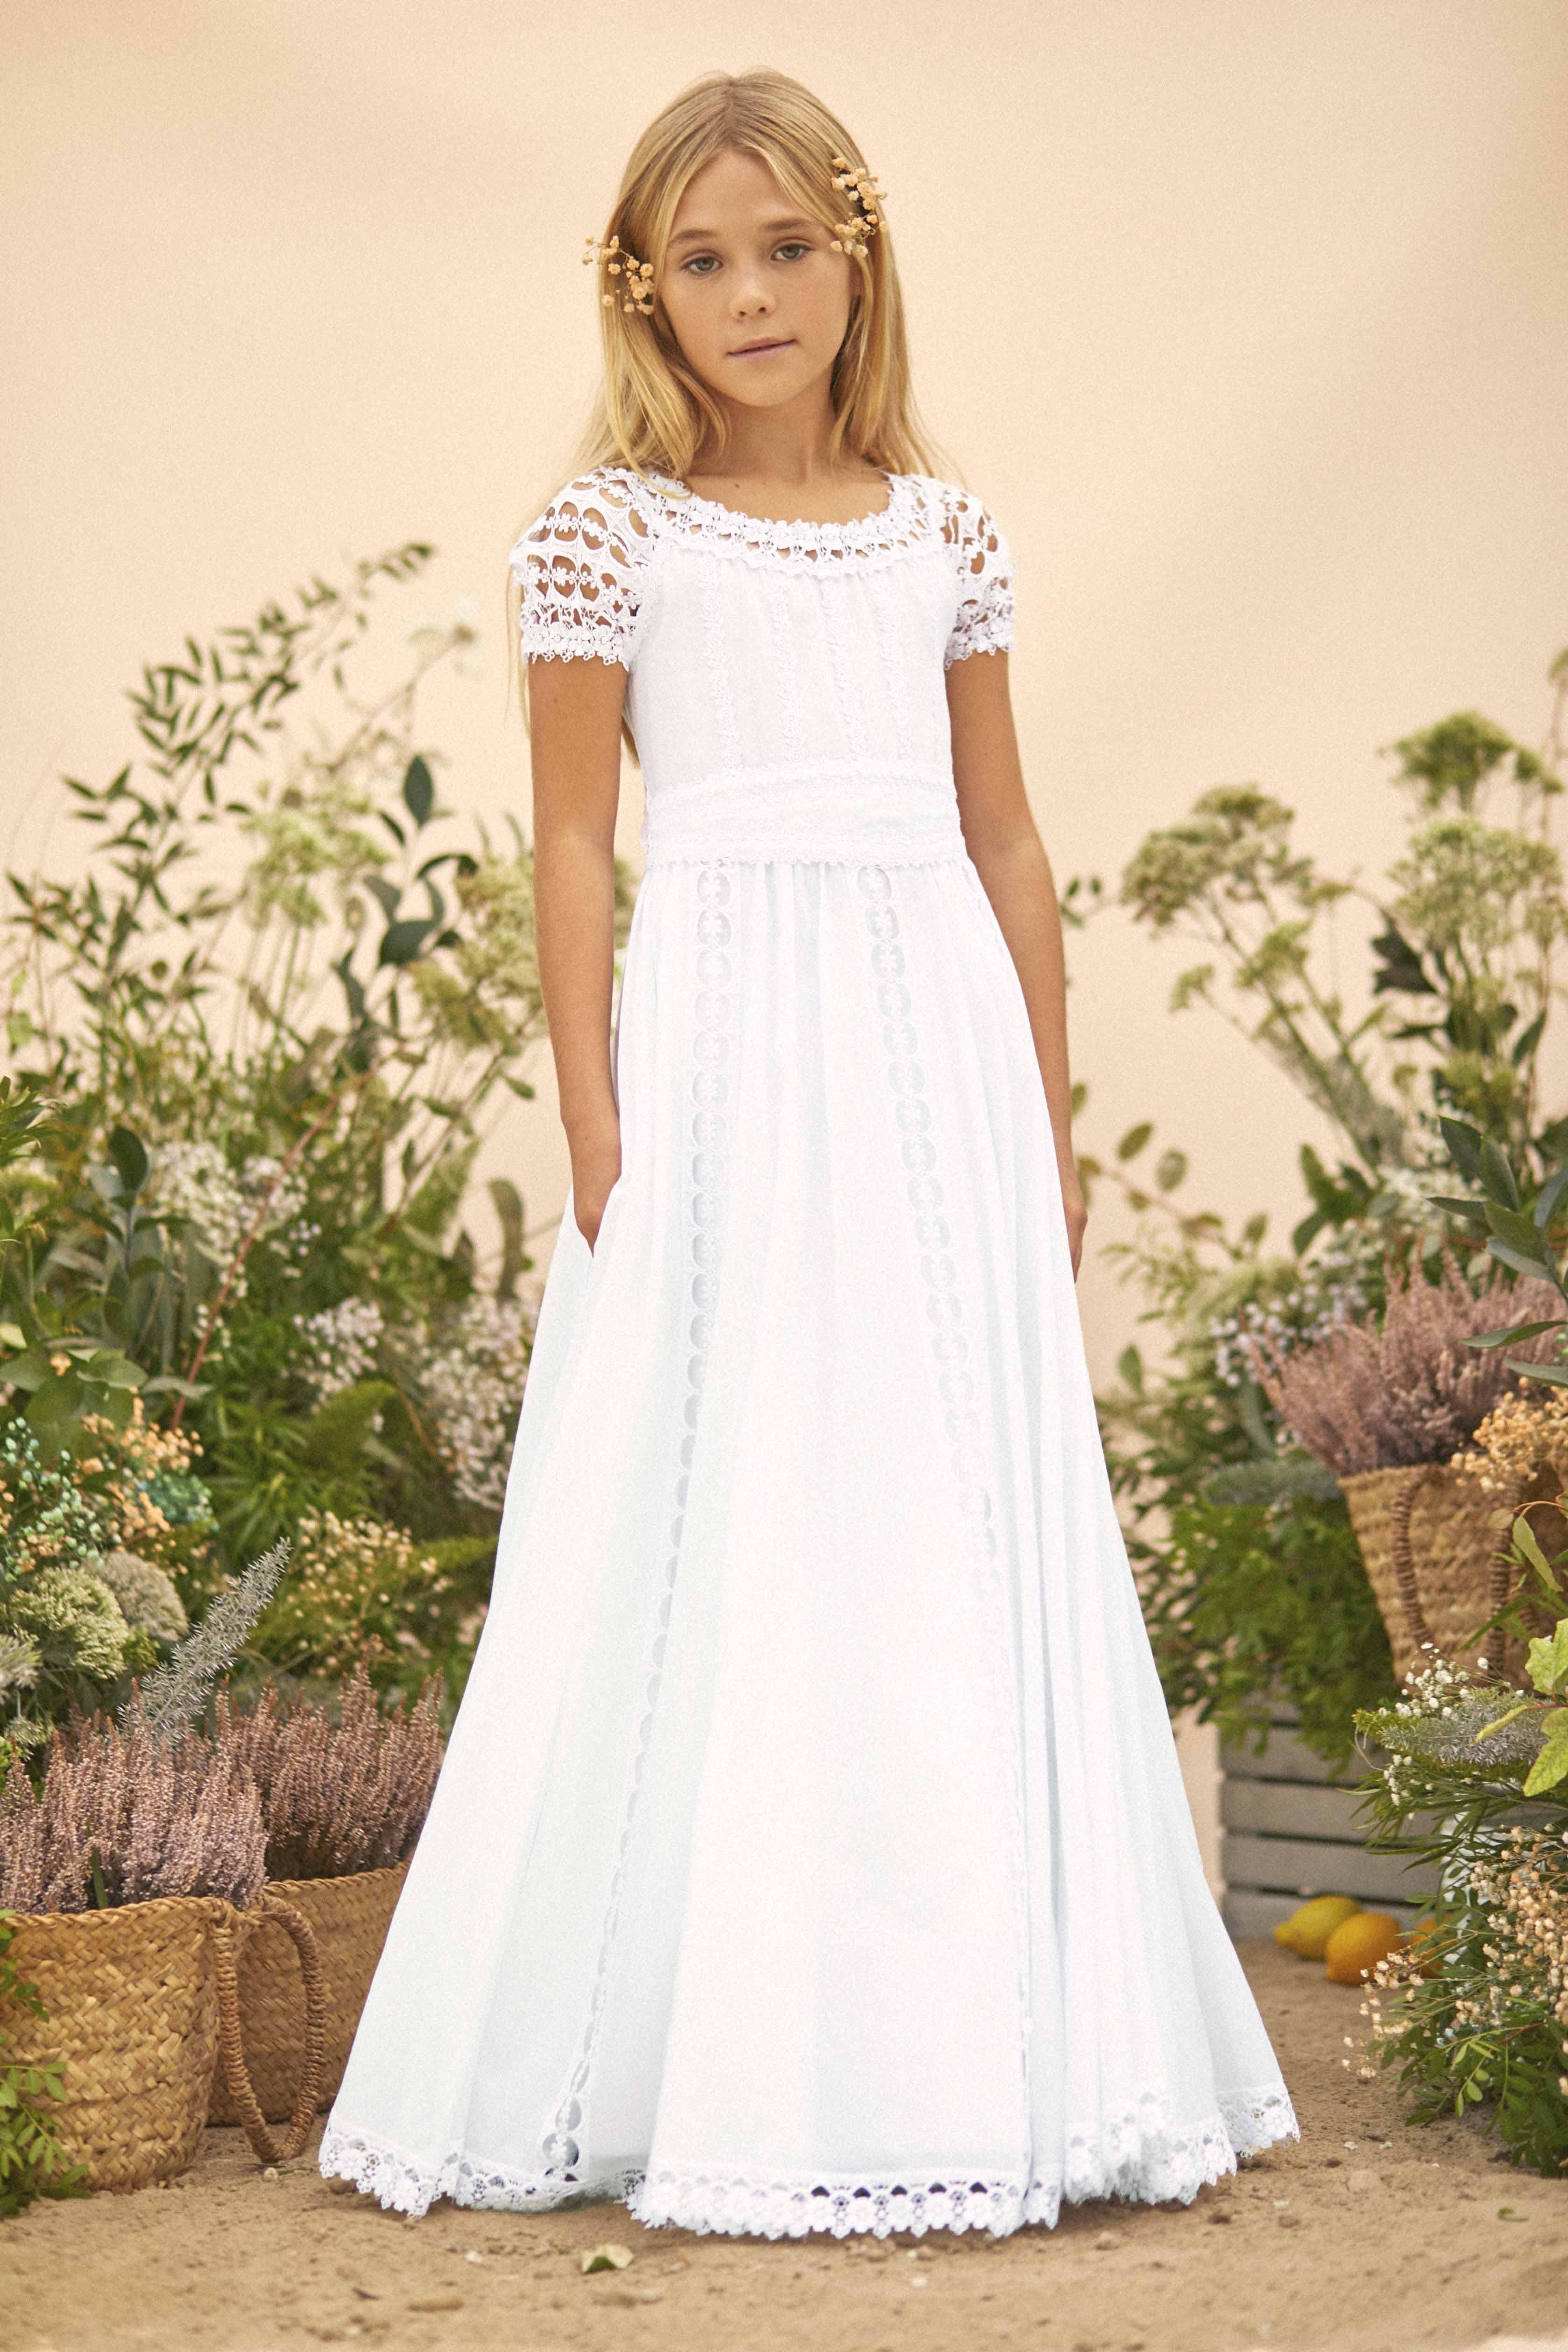 Blancanieves Dress